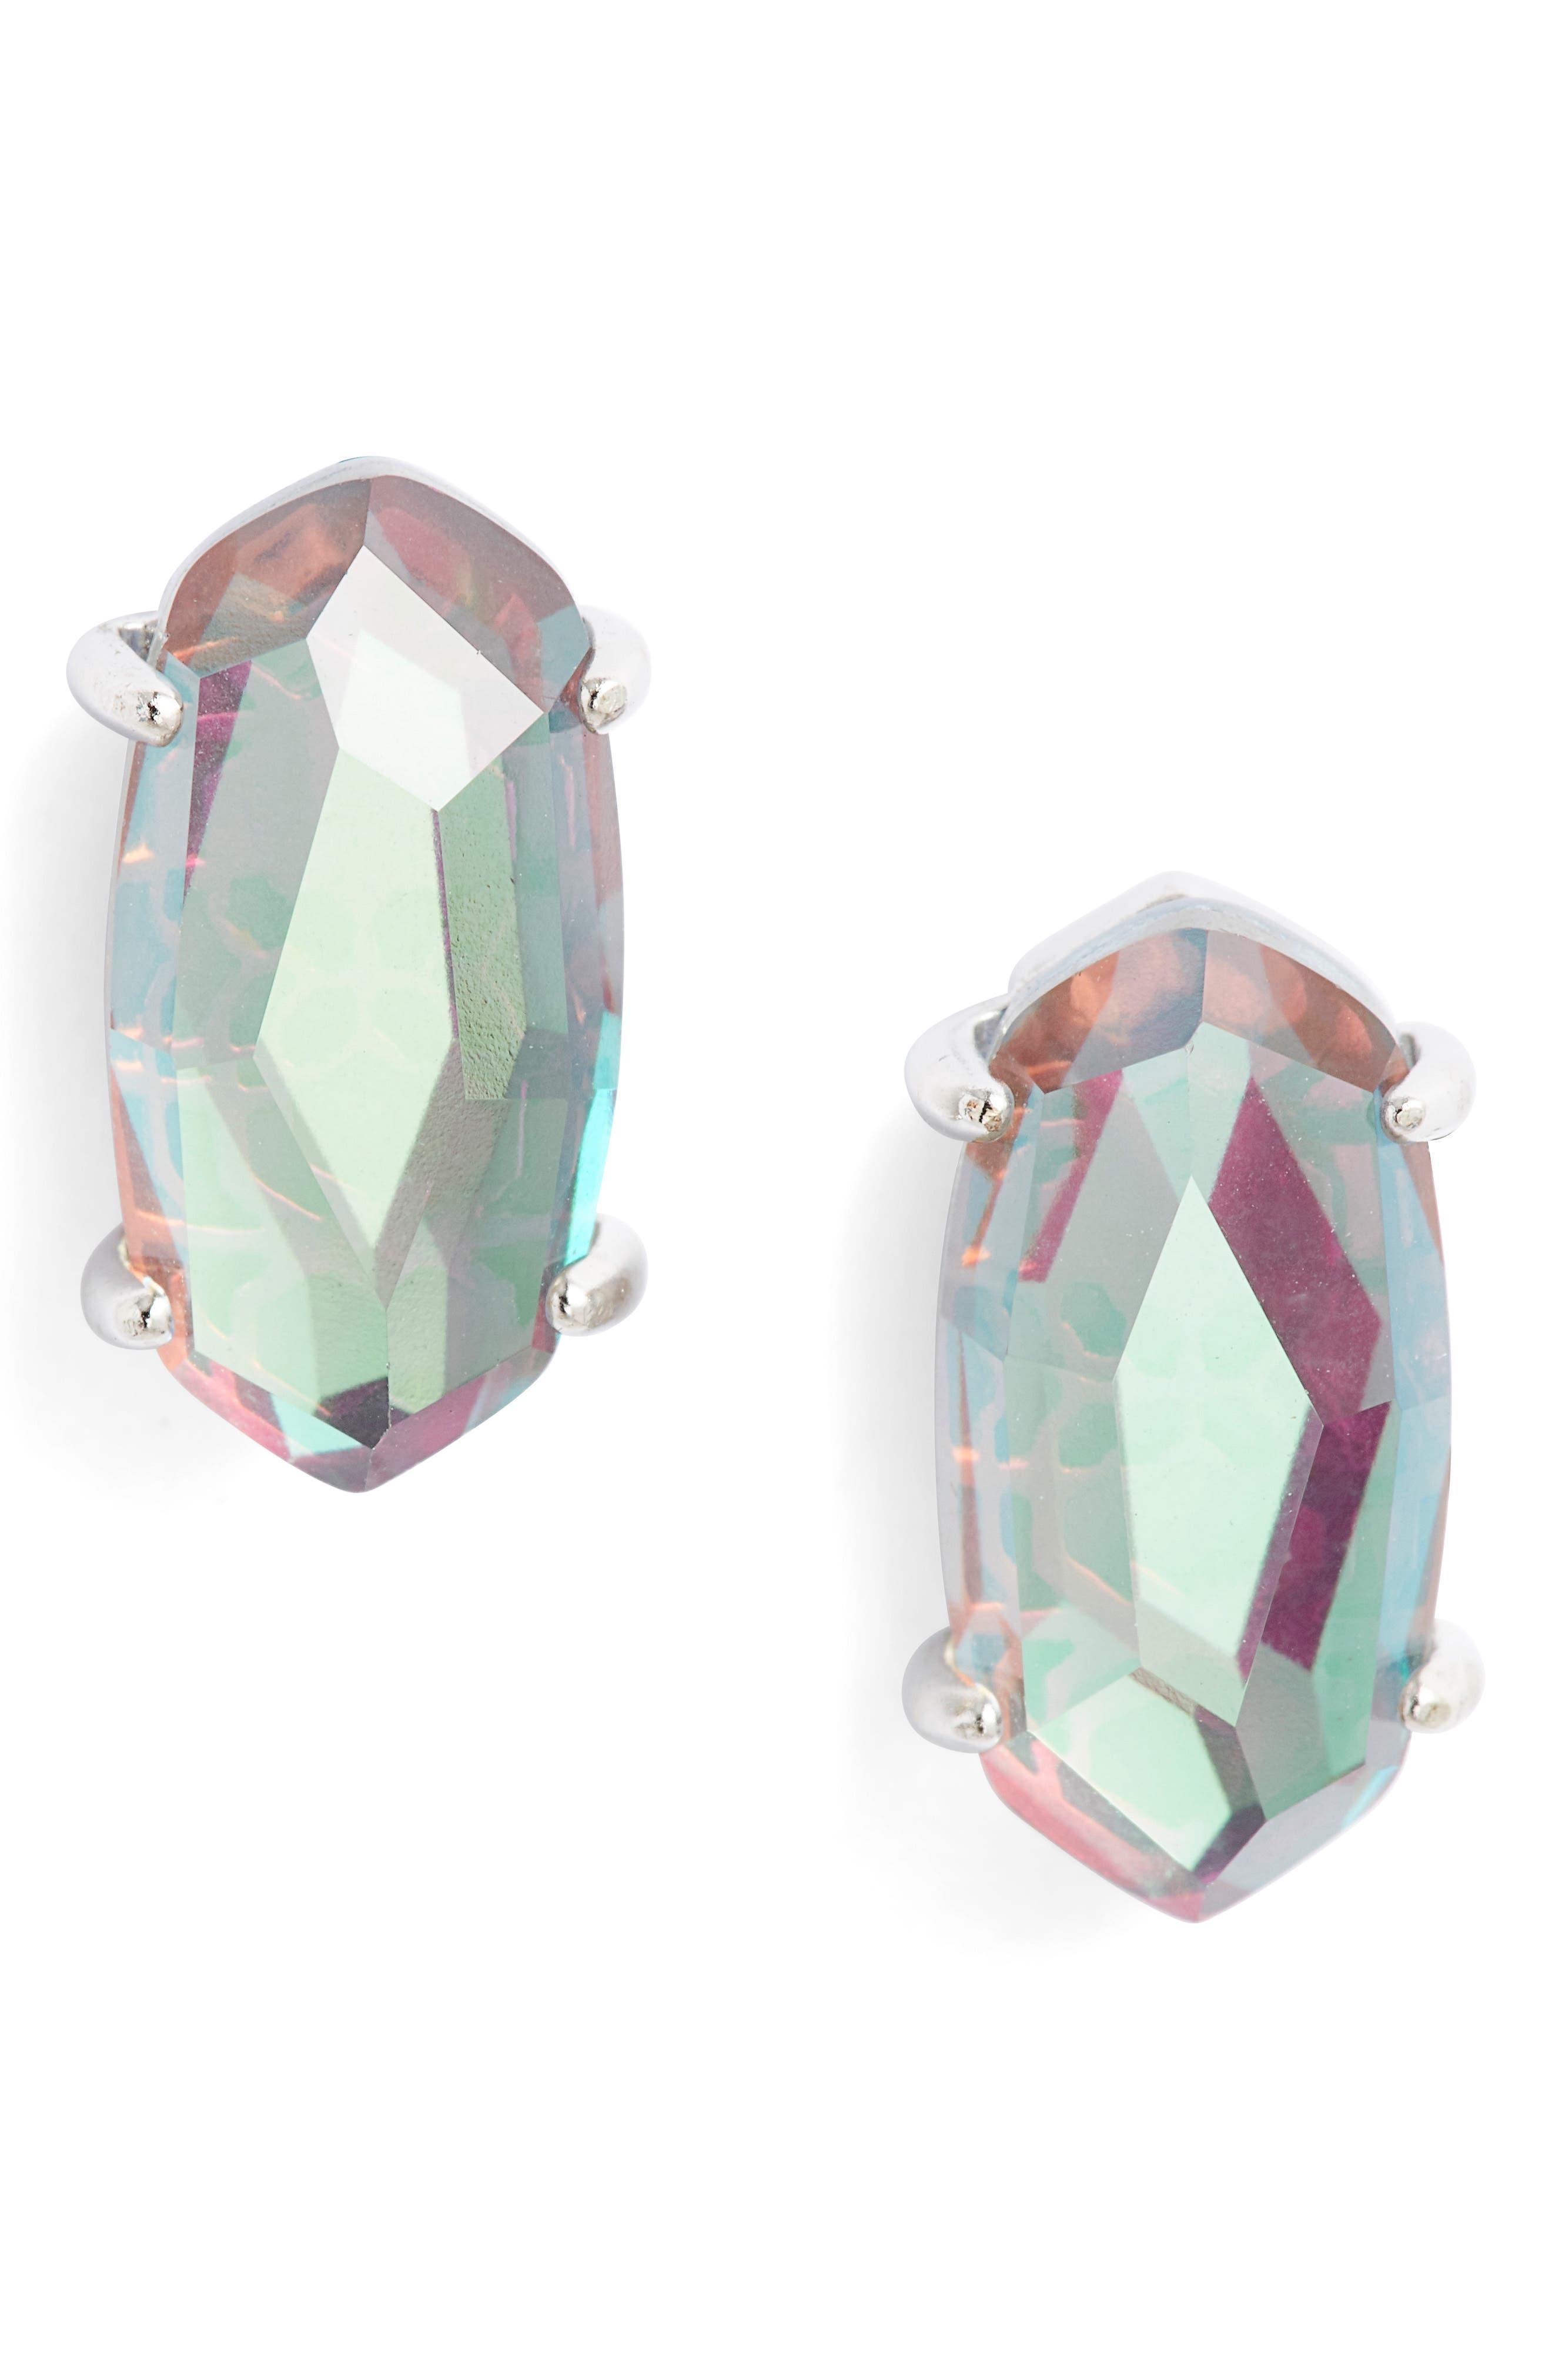 KENDRA SCOTT, Betty Stud Earrings, Main thumbnail 1, color, GRAY DICHROIC GLASS/ SILVER